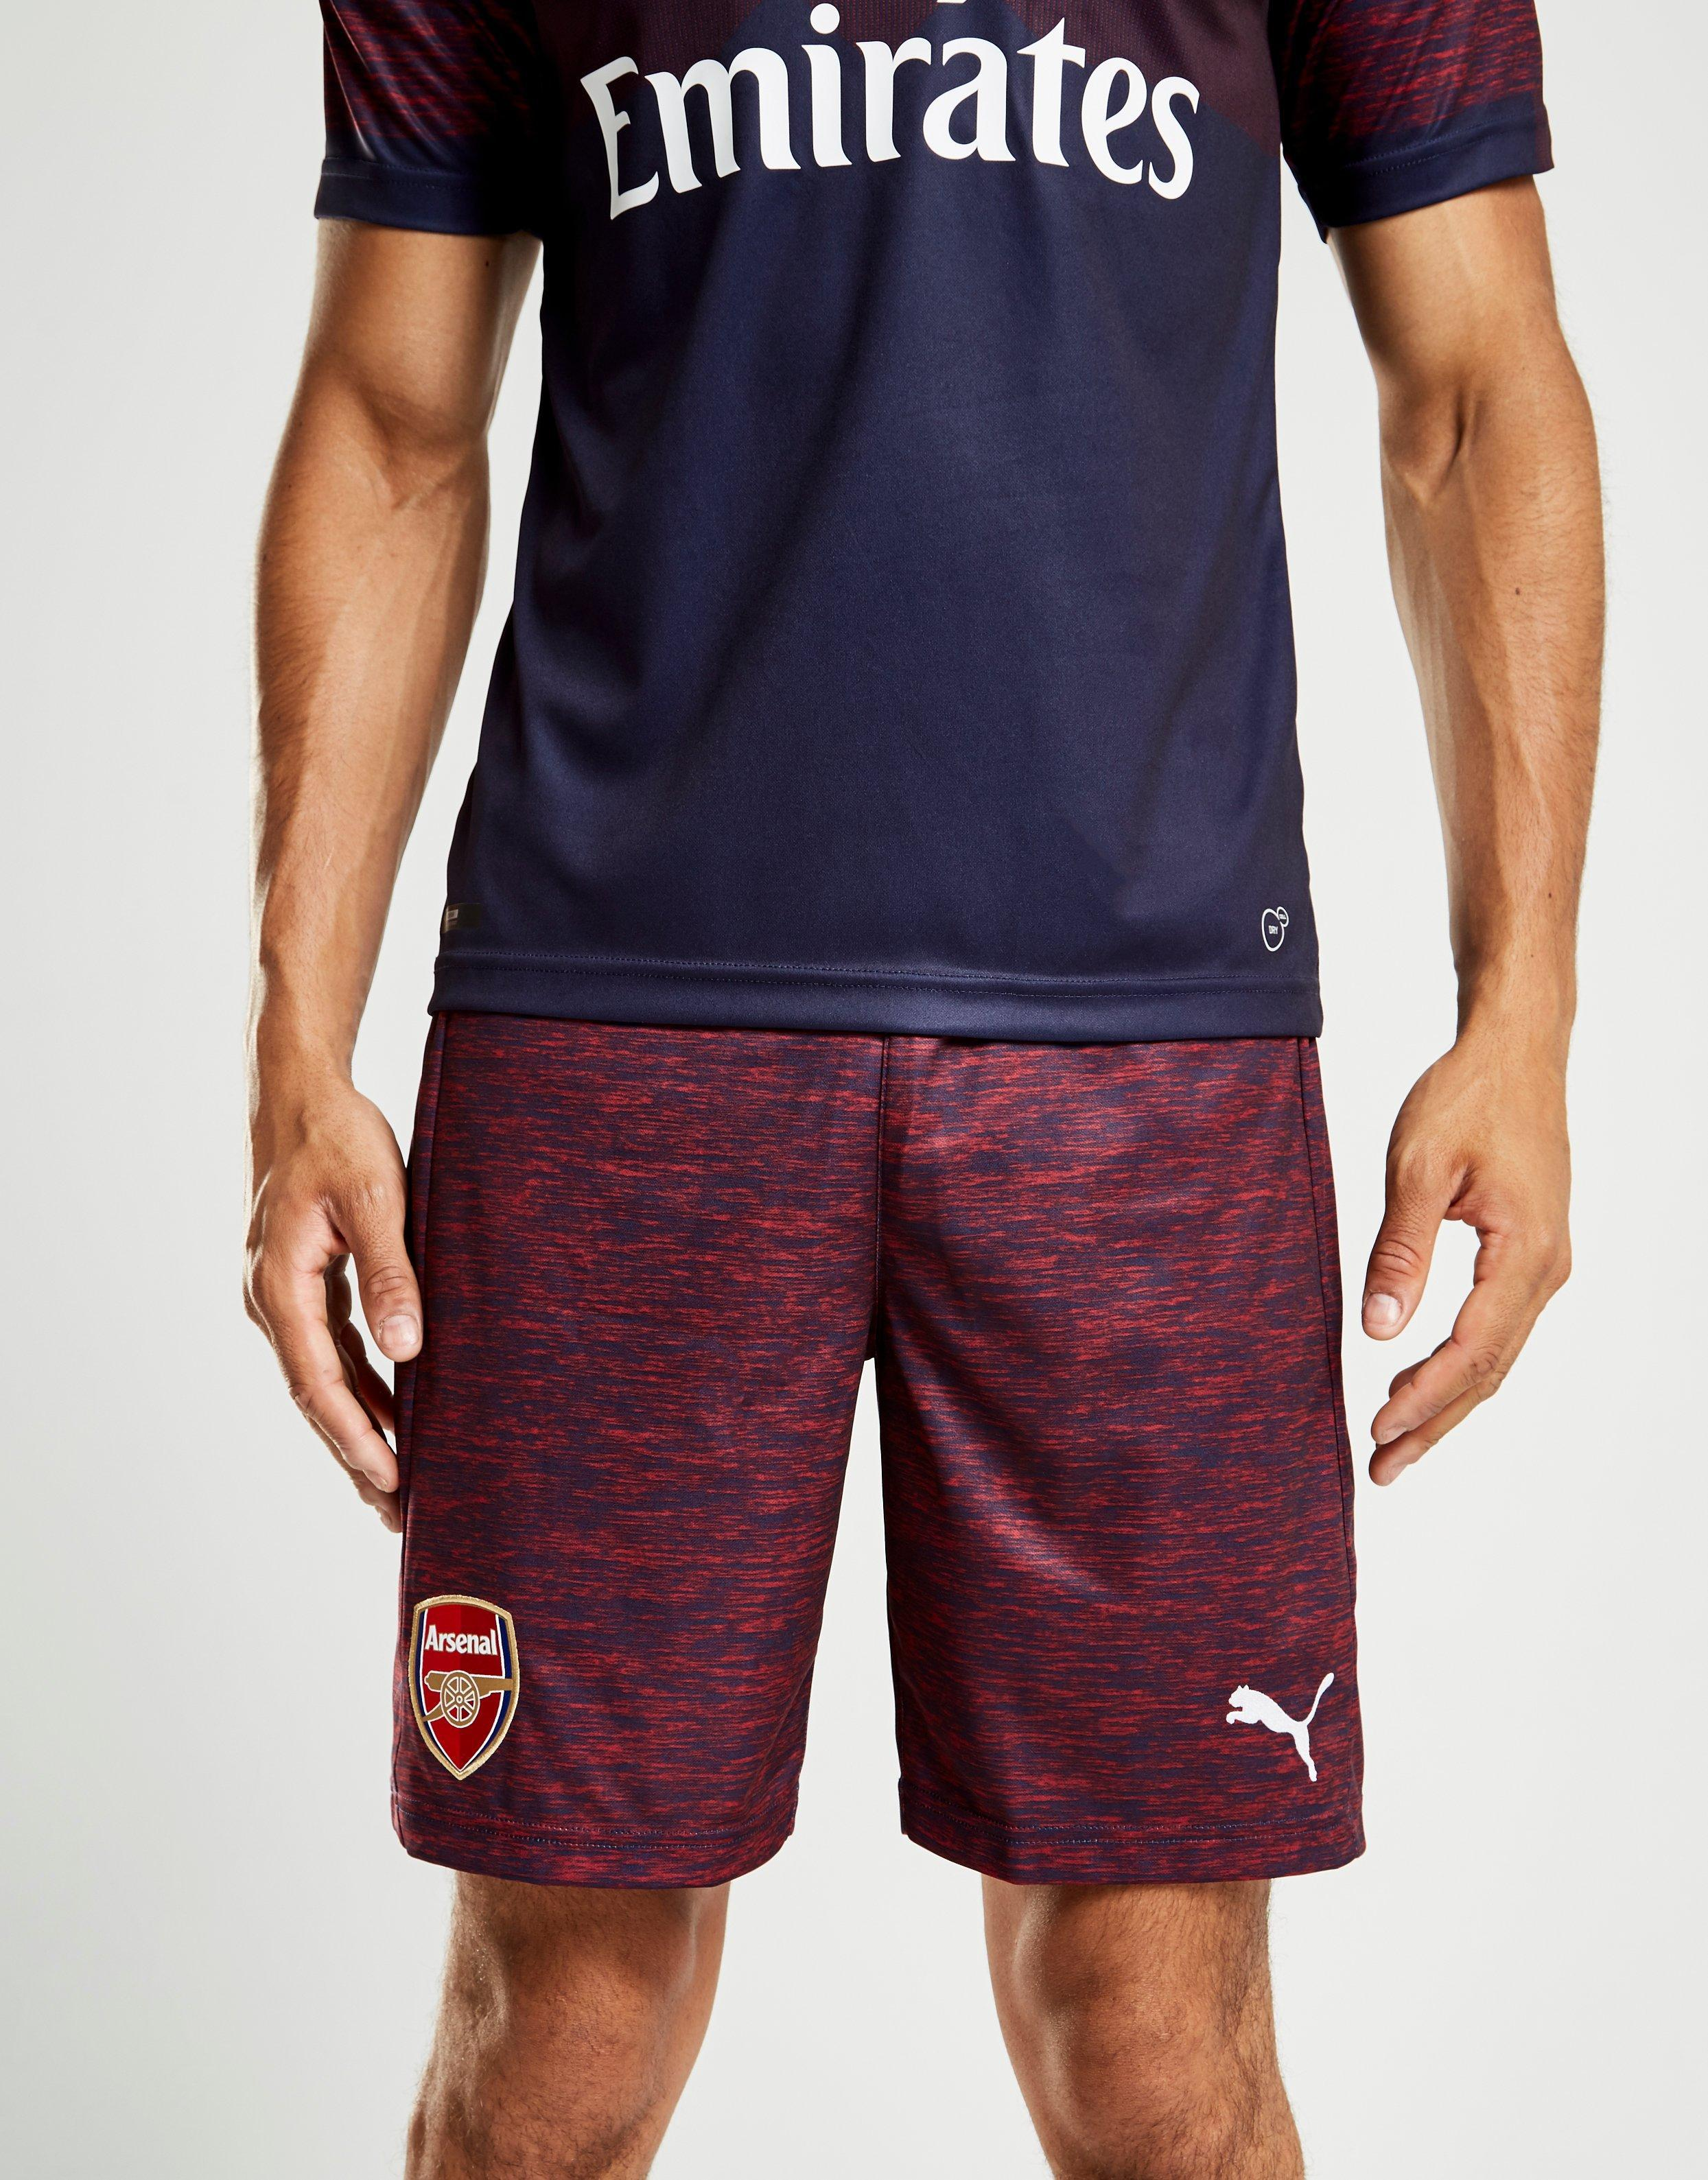 5427eb97b PUMA Arsenal Fc 2018 19 Away Shorts in Blue for Men - Lyst